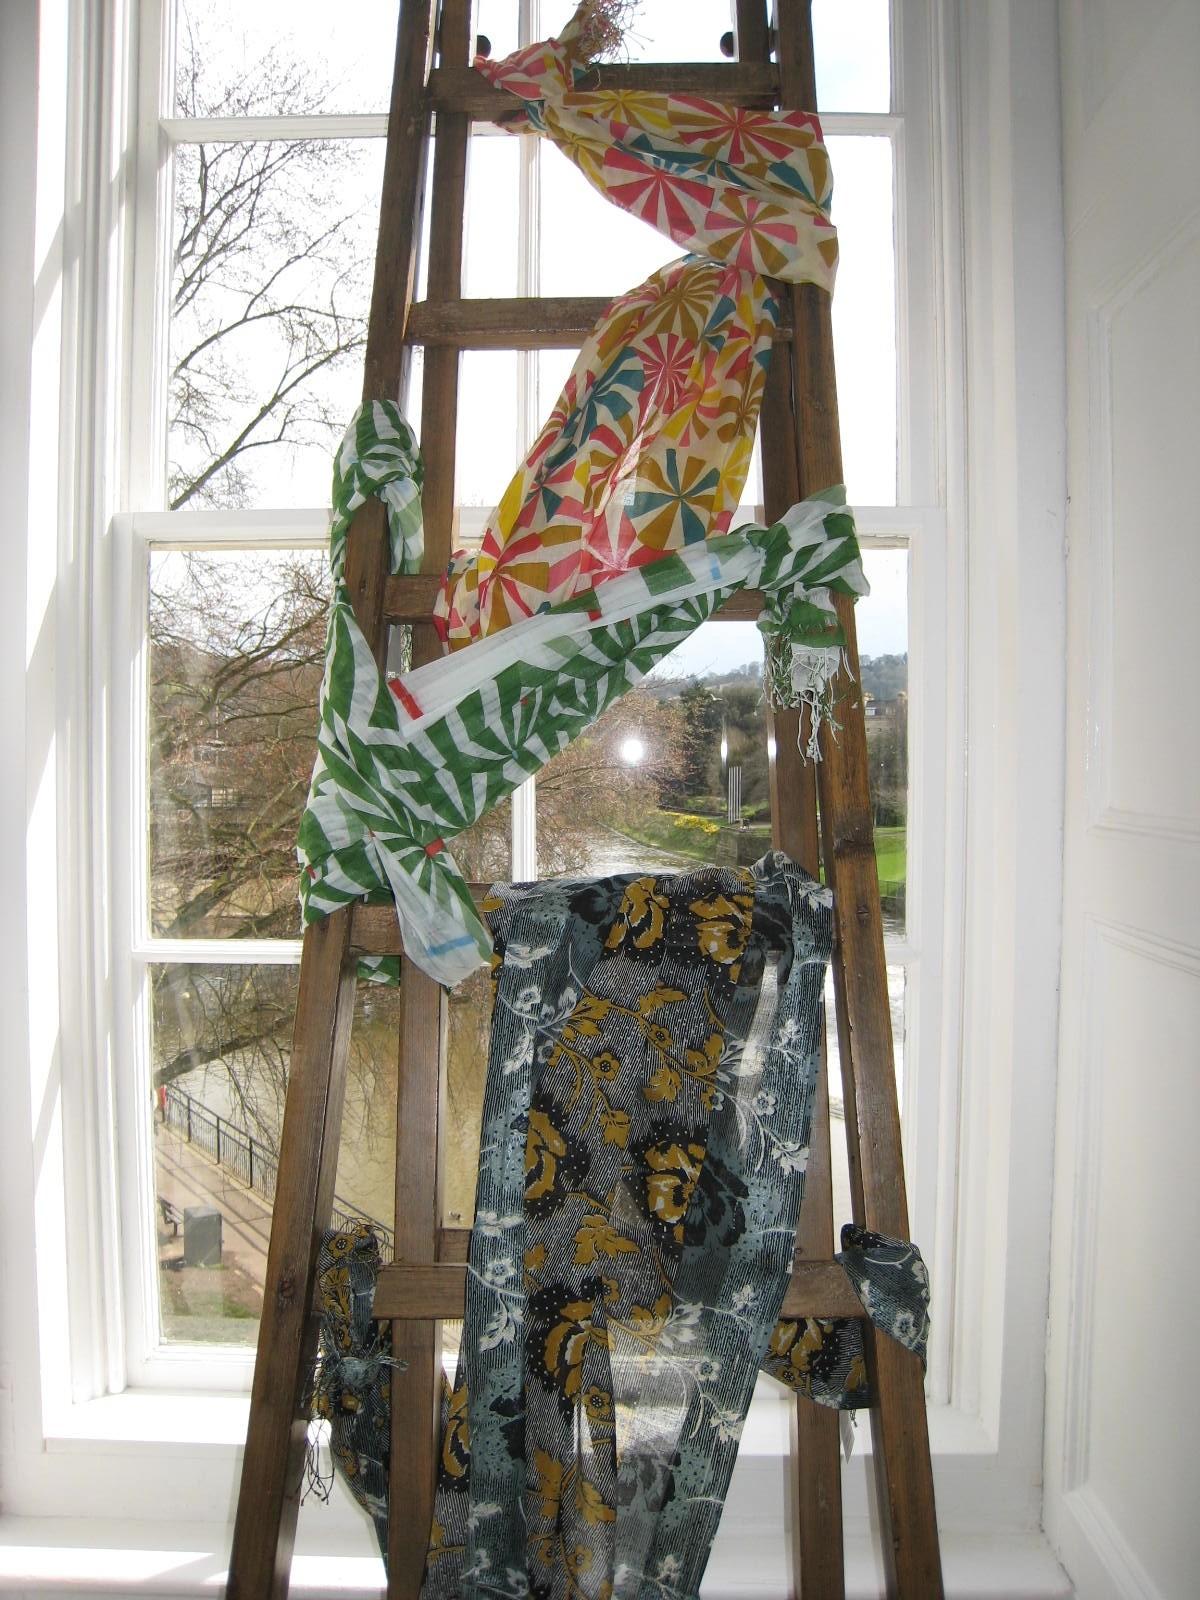 found - epice scarves ladder green